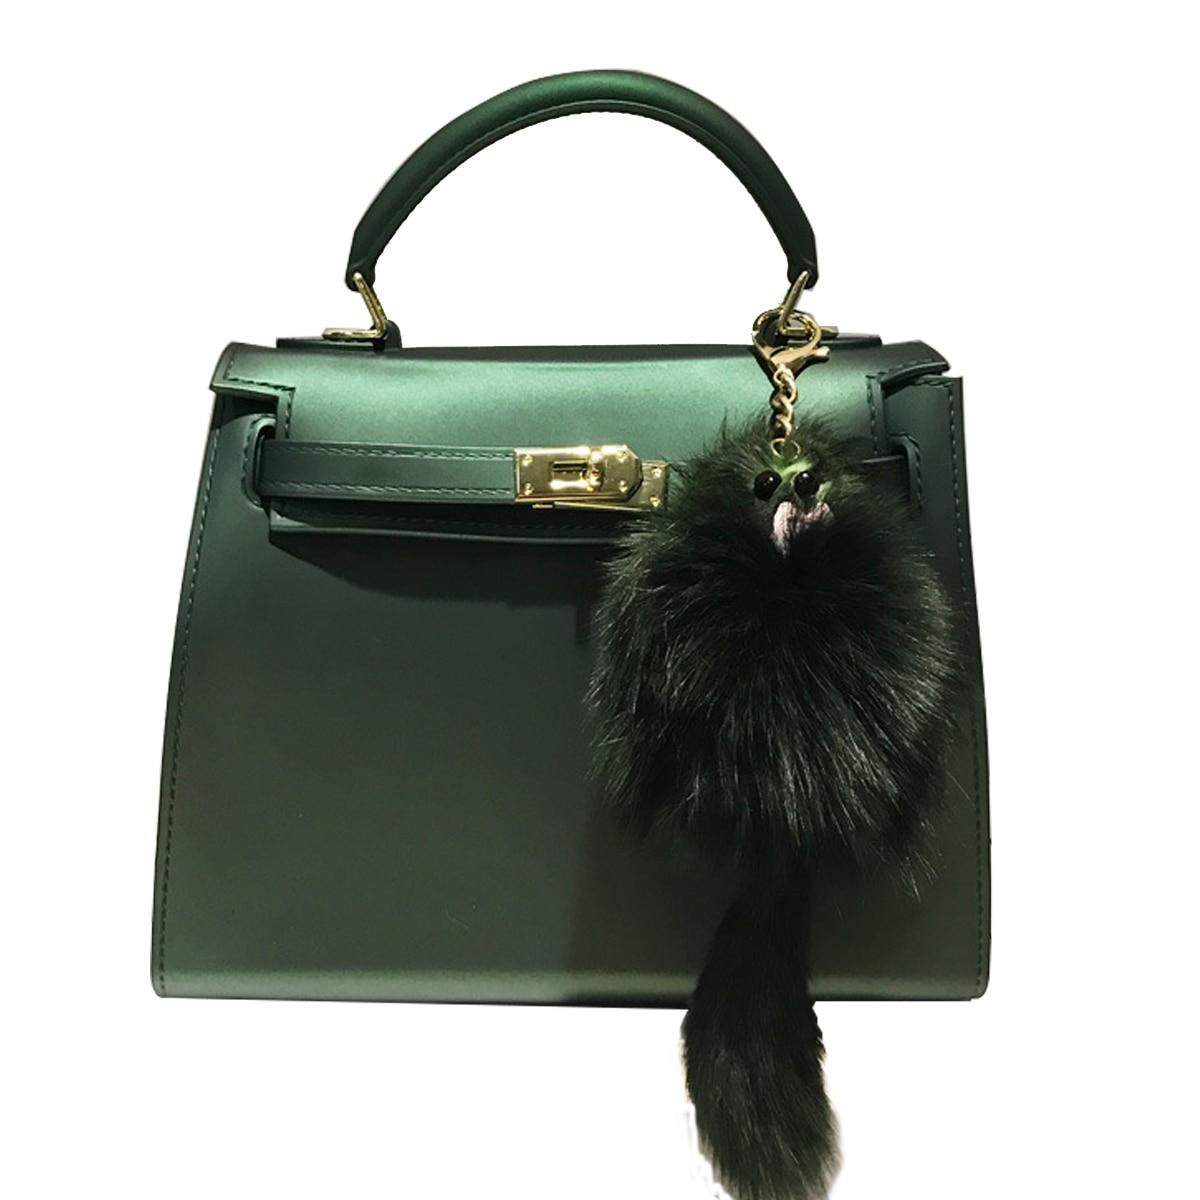 Luxury Handbags Women Bags Brand Women Messenger Bags Designer Jelly Bag Fashion Shoulder Bag Women Pu Leather Handbags<br>